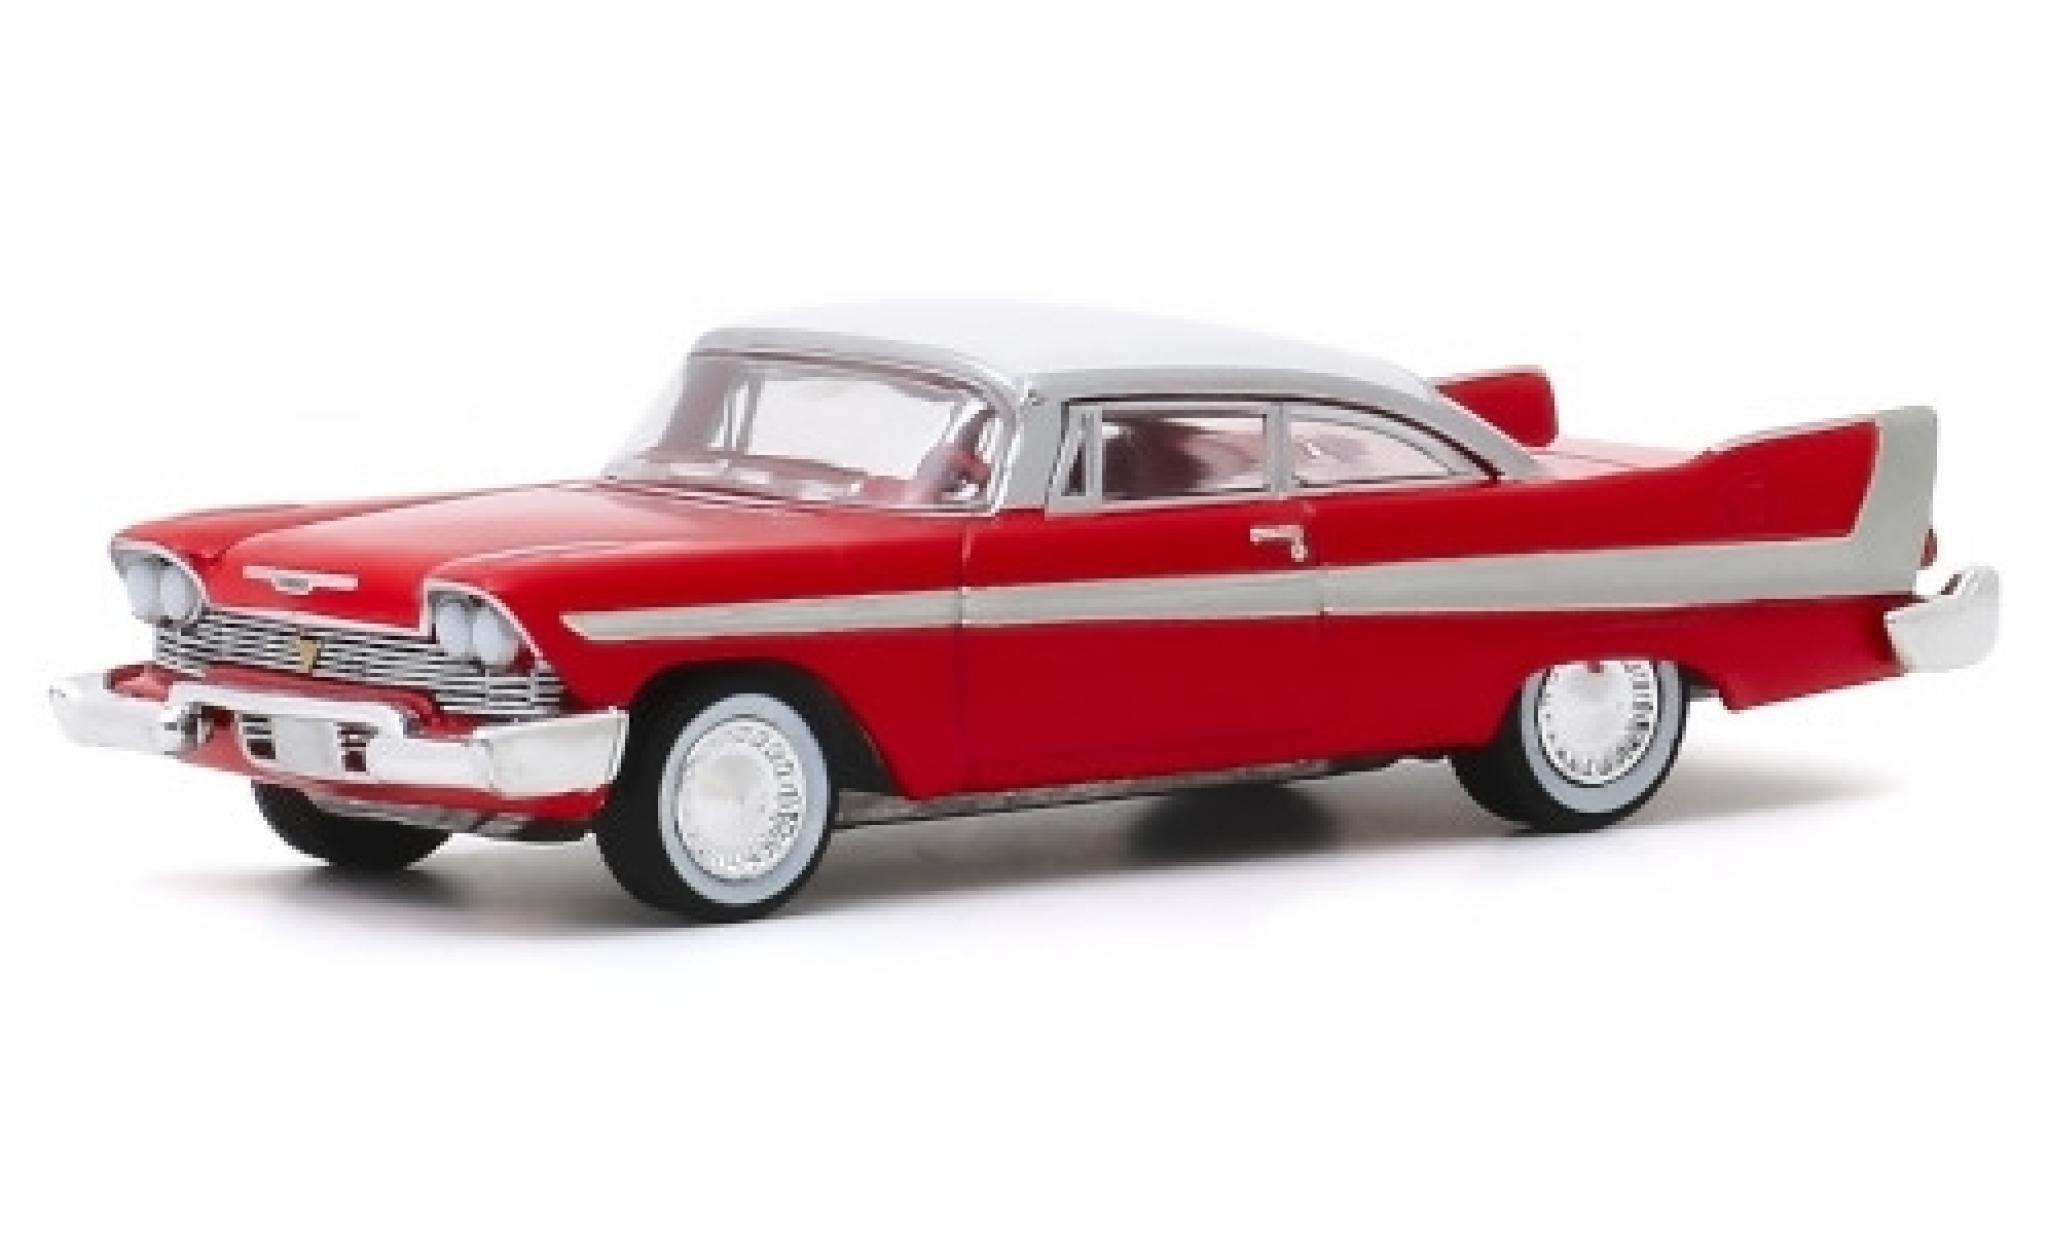 Plymouth Fury 1958 Christine rot-weiß auto world 1:64